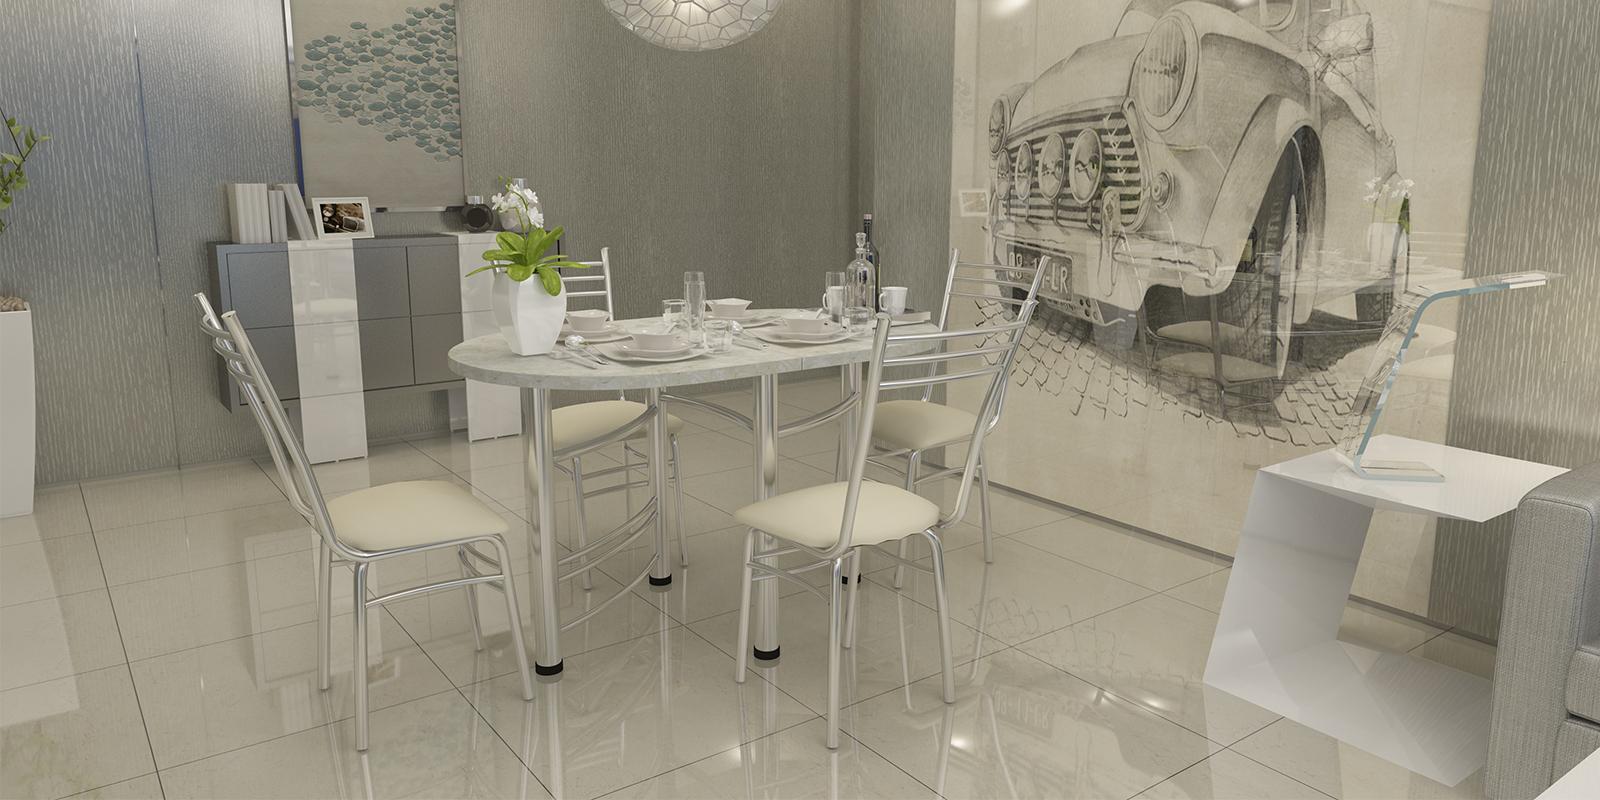 Стол обеденный Орион (мрамор/хром)